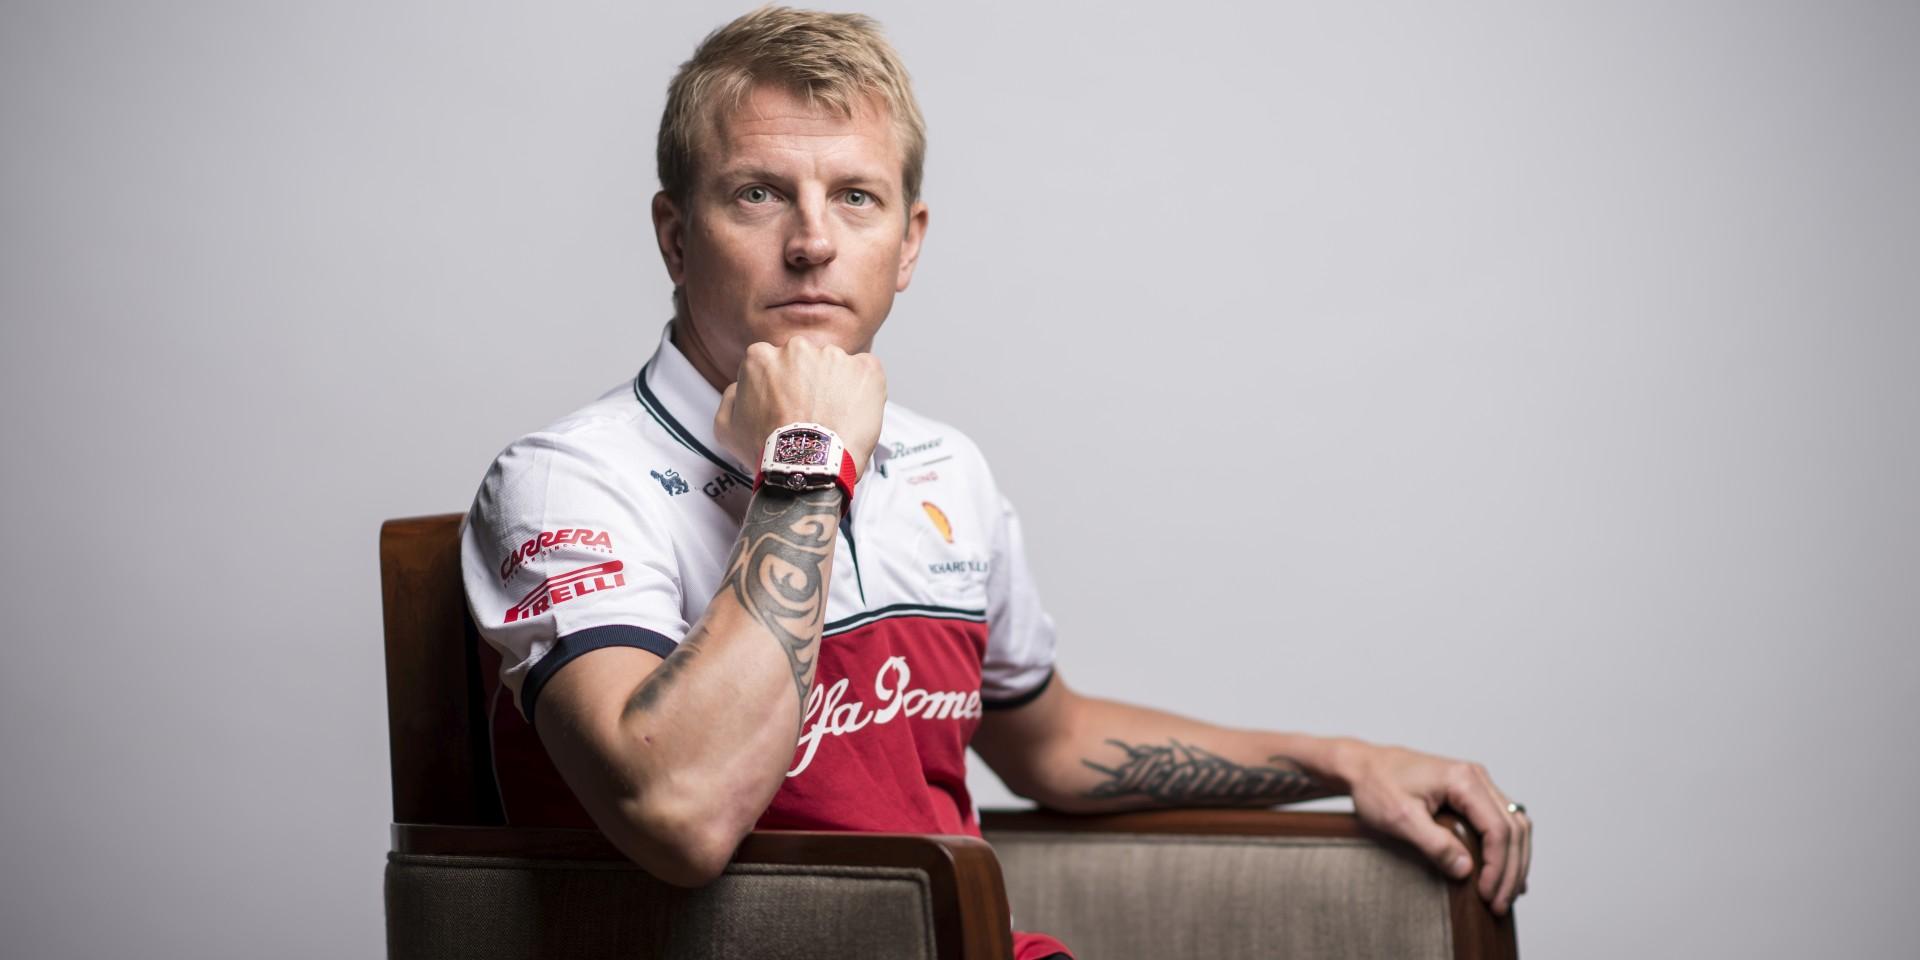 RICHARD MILLE 攜手F1世界冠軍「冰人」雷克南,呈獻RM 50-04 Kimi Räikkönen雙秒追針陀飛輪計時碼錶